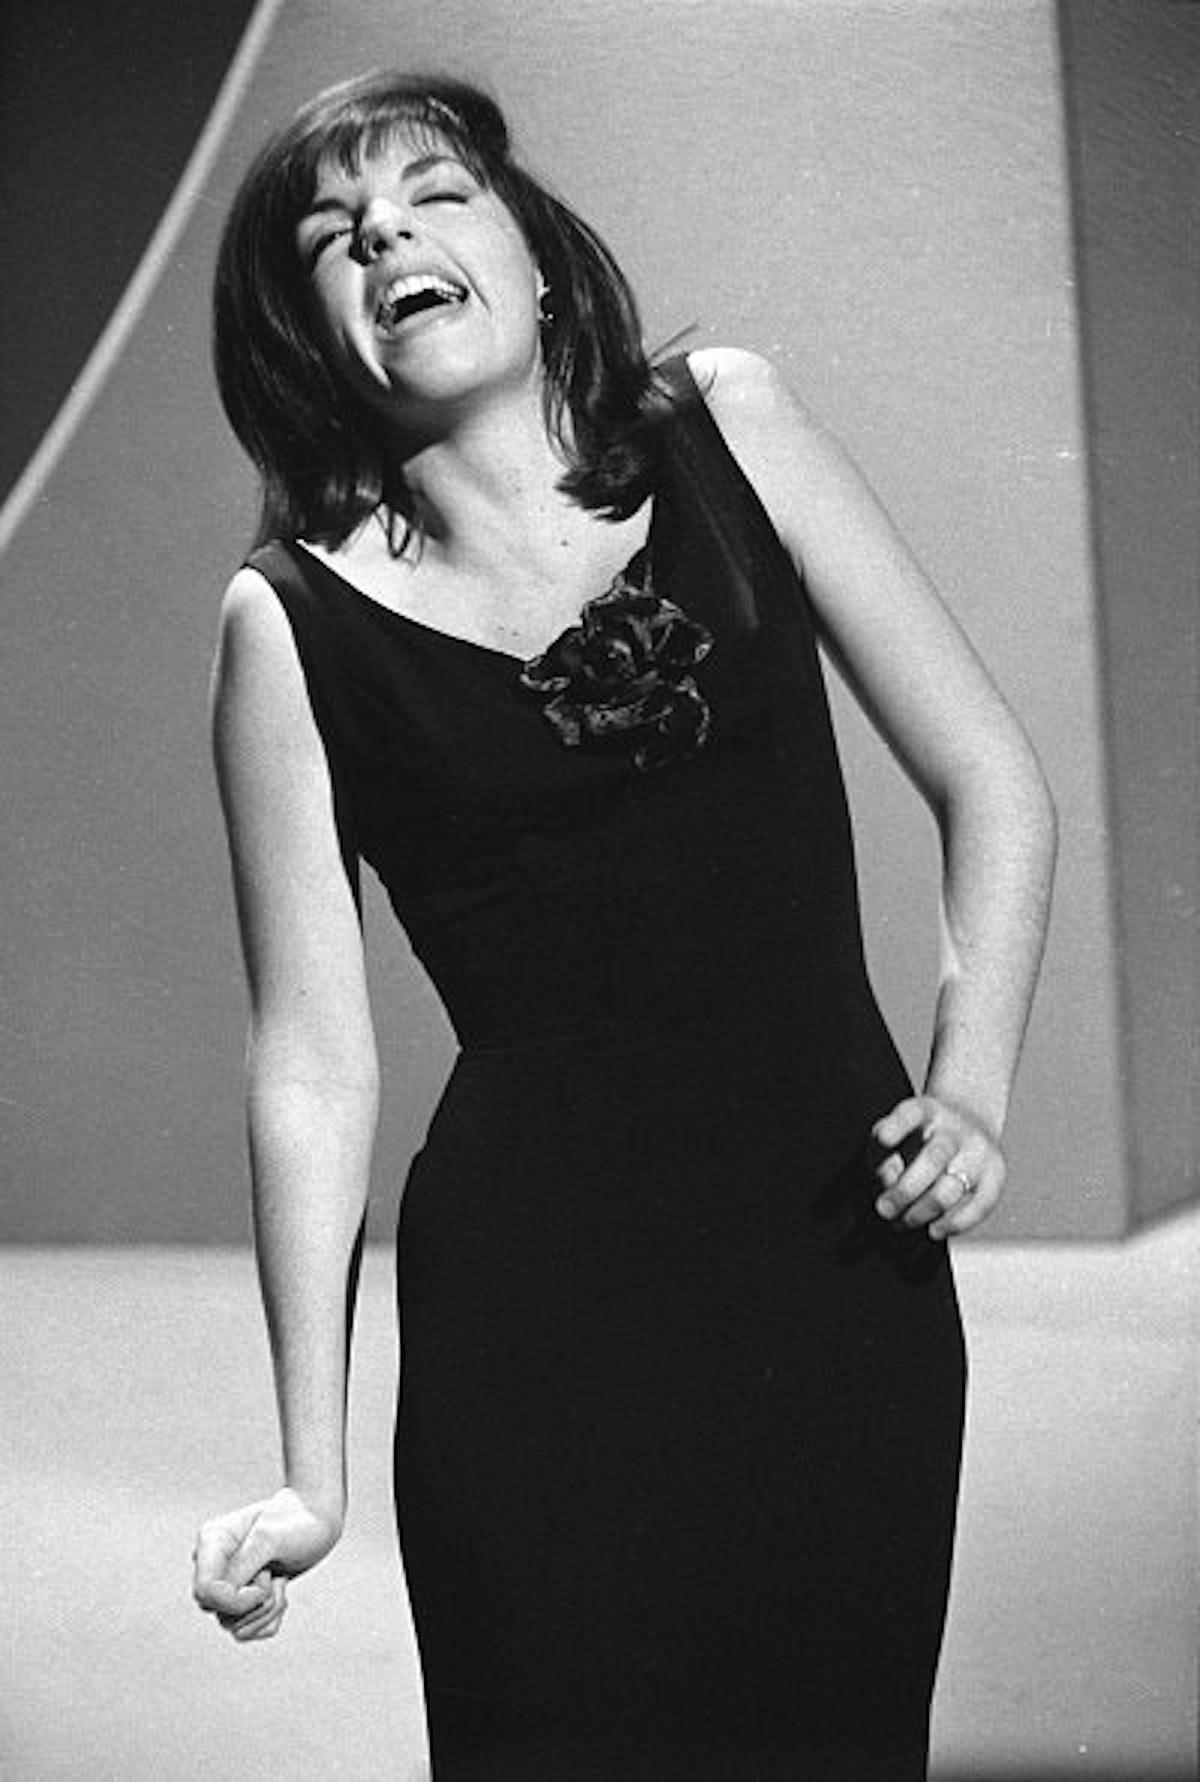 Liza wearing a classic black dress